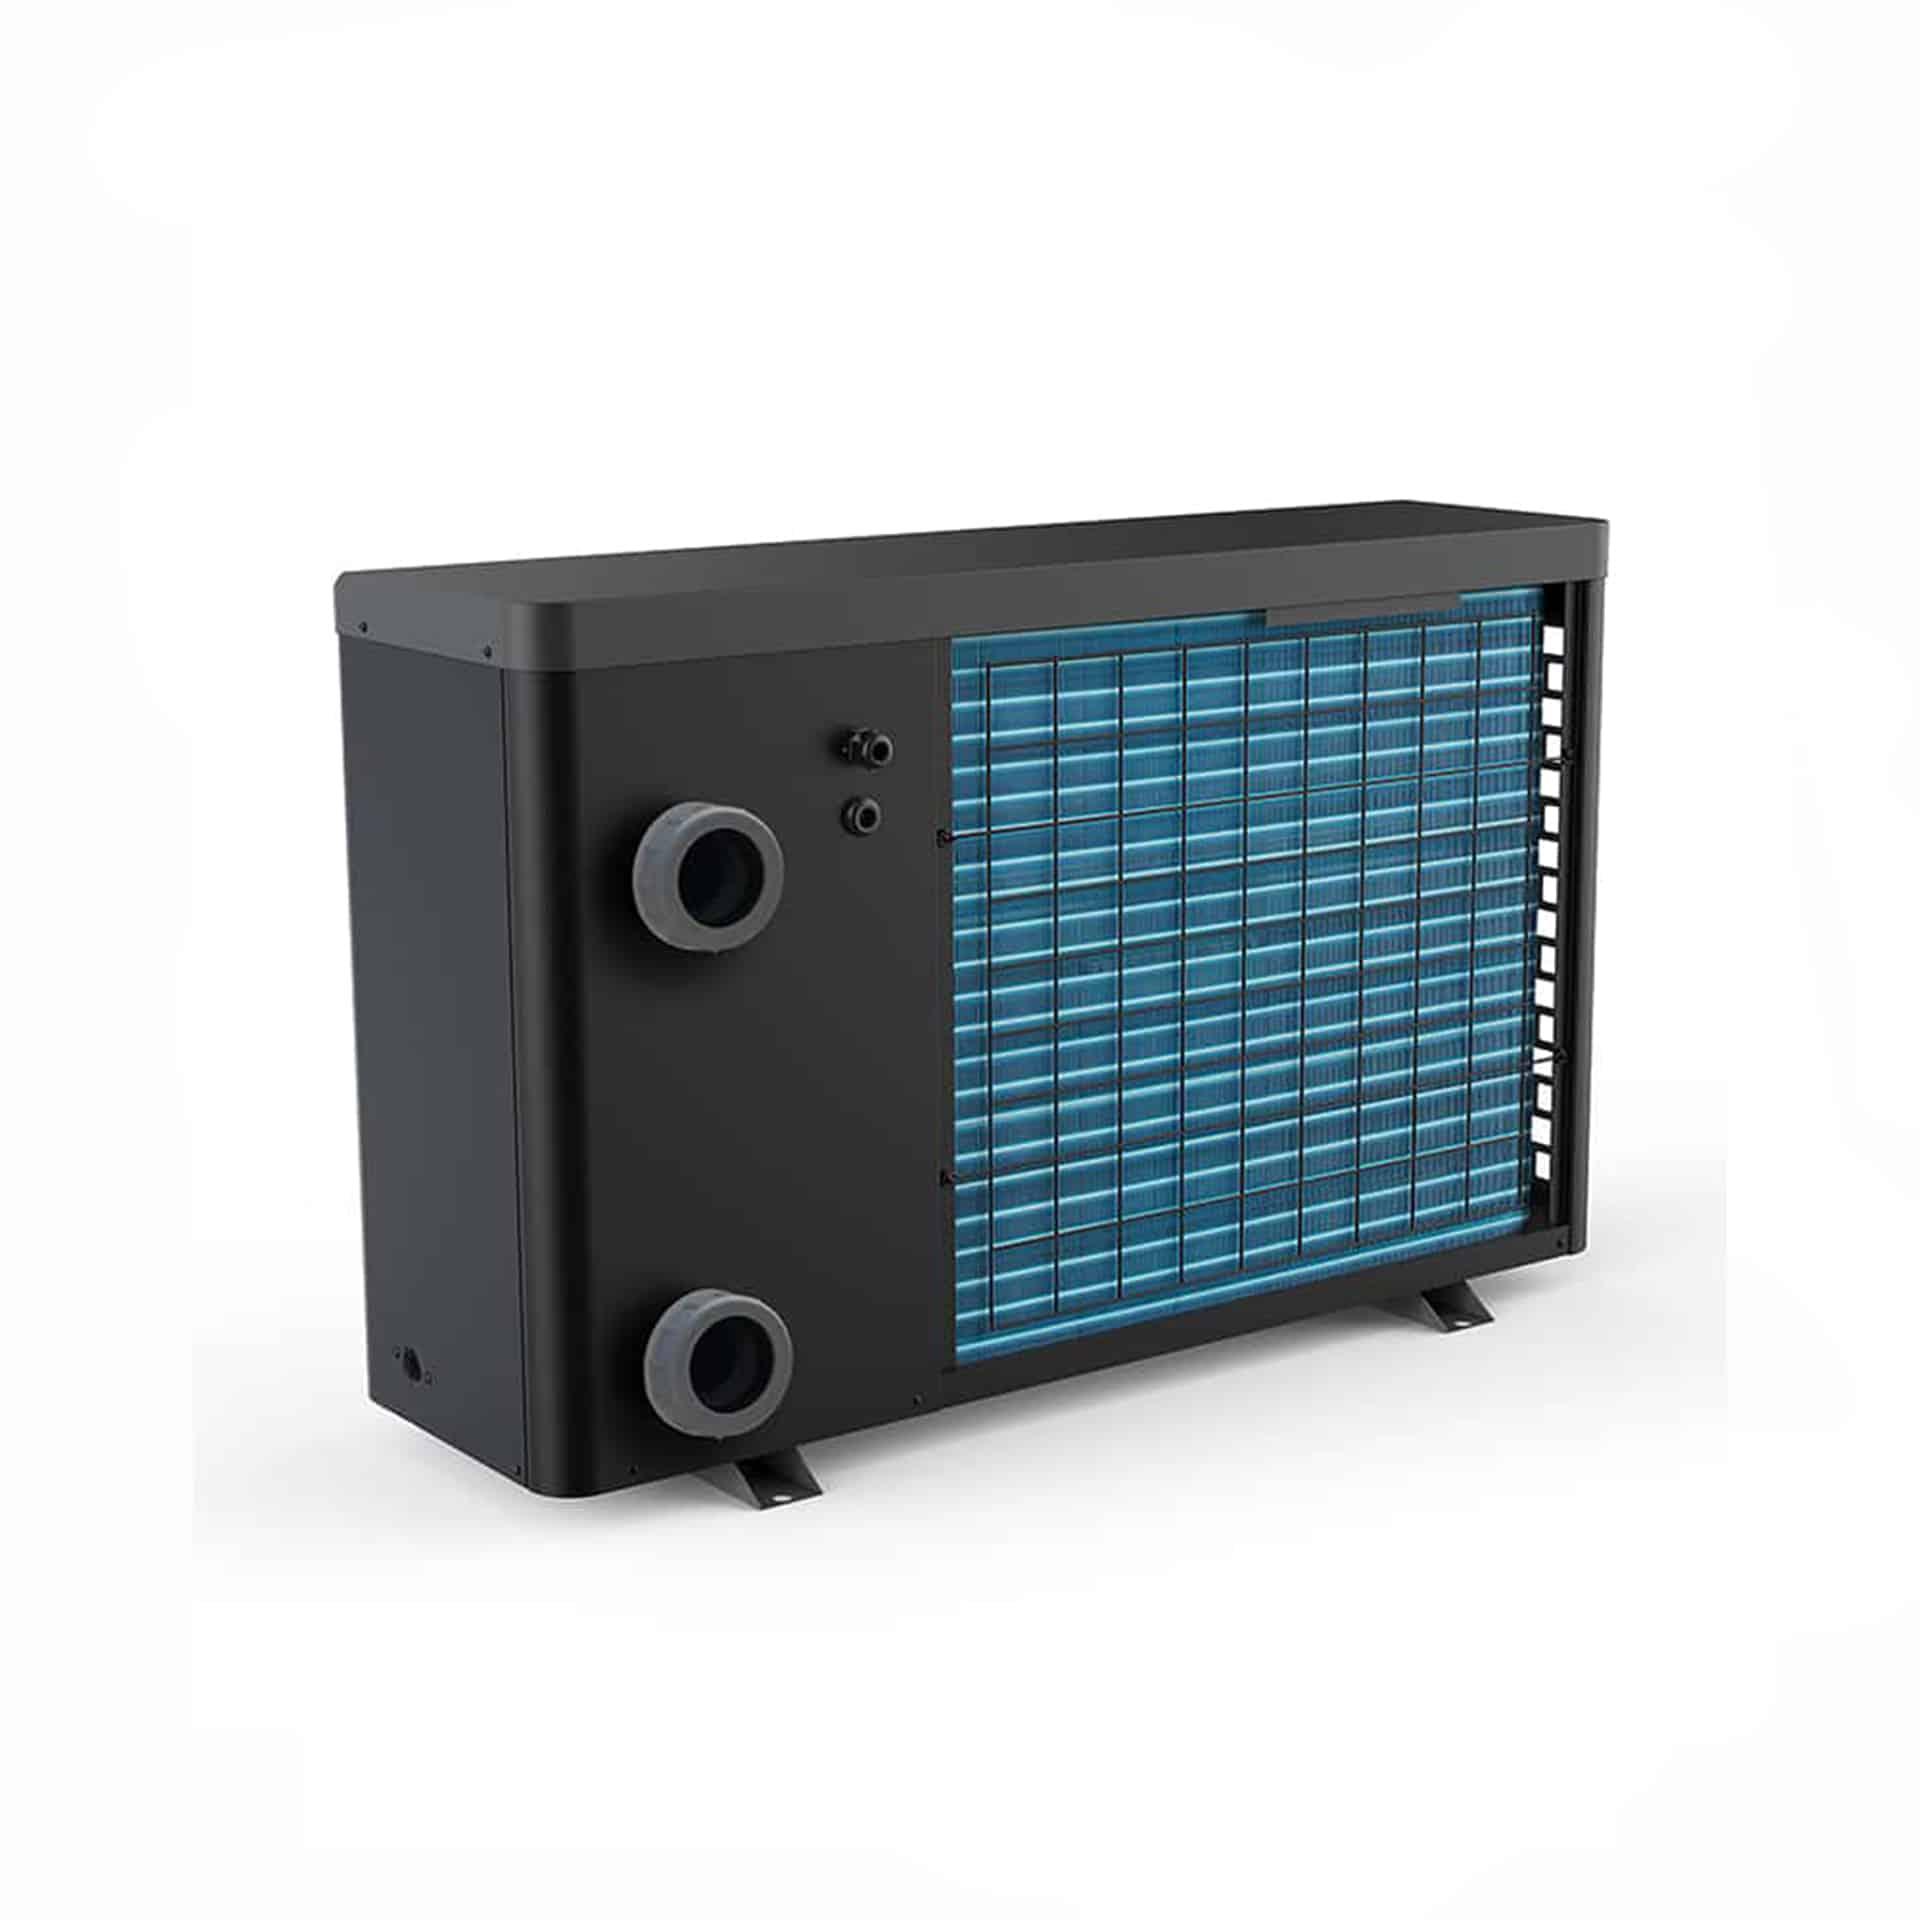 HeatBooster Pro Varmepumpe med WiFi 13.5 KW bakside